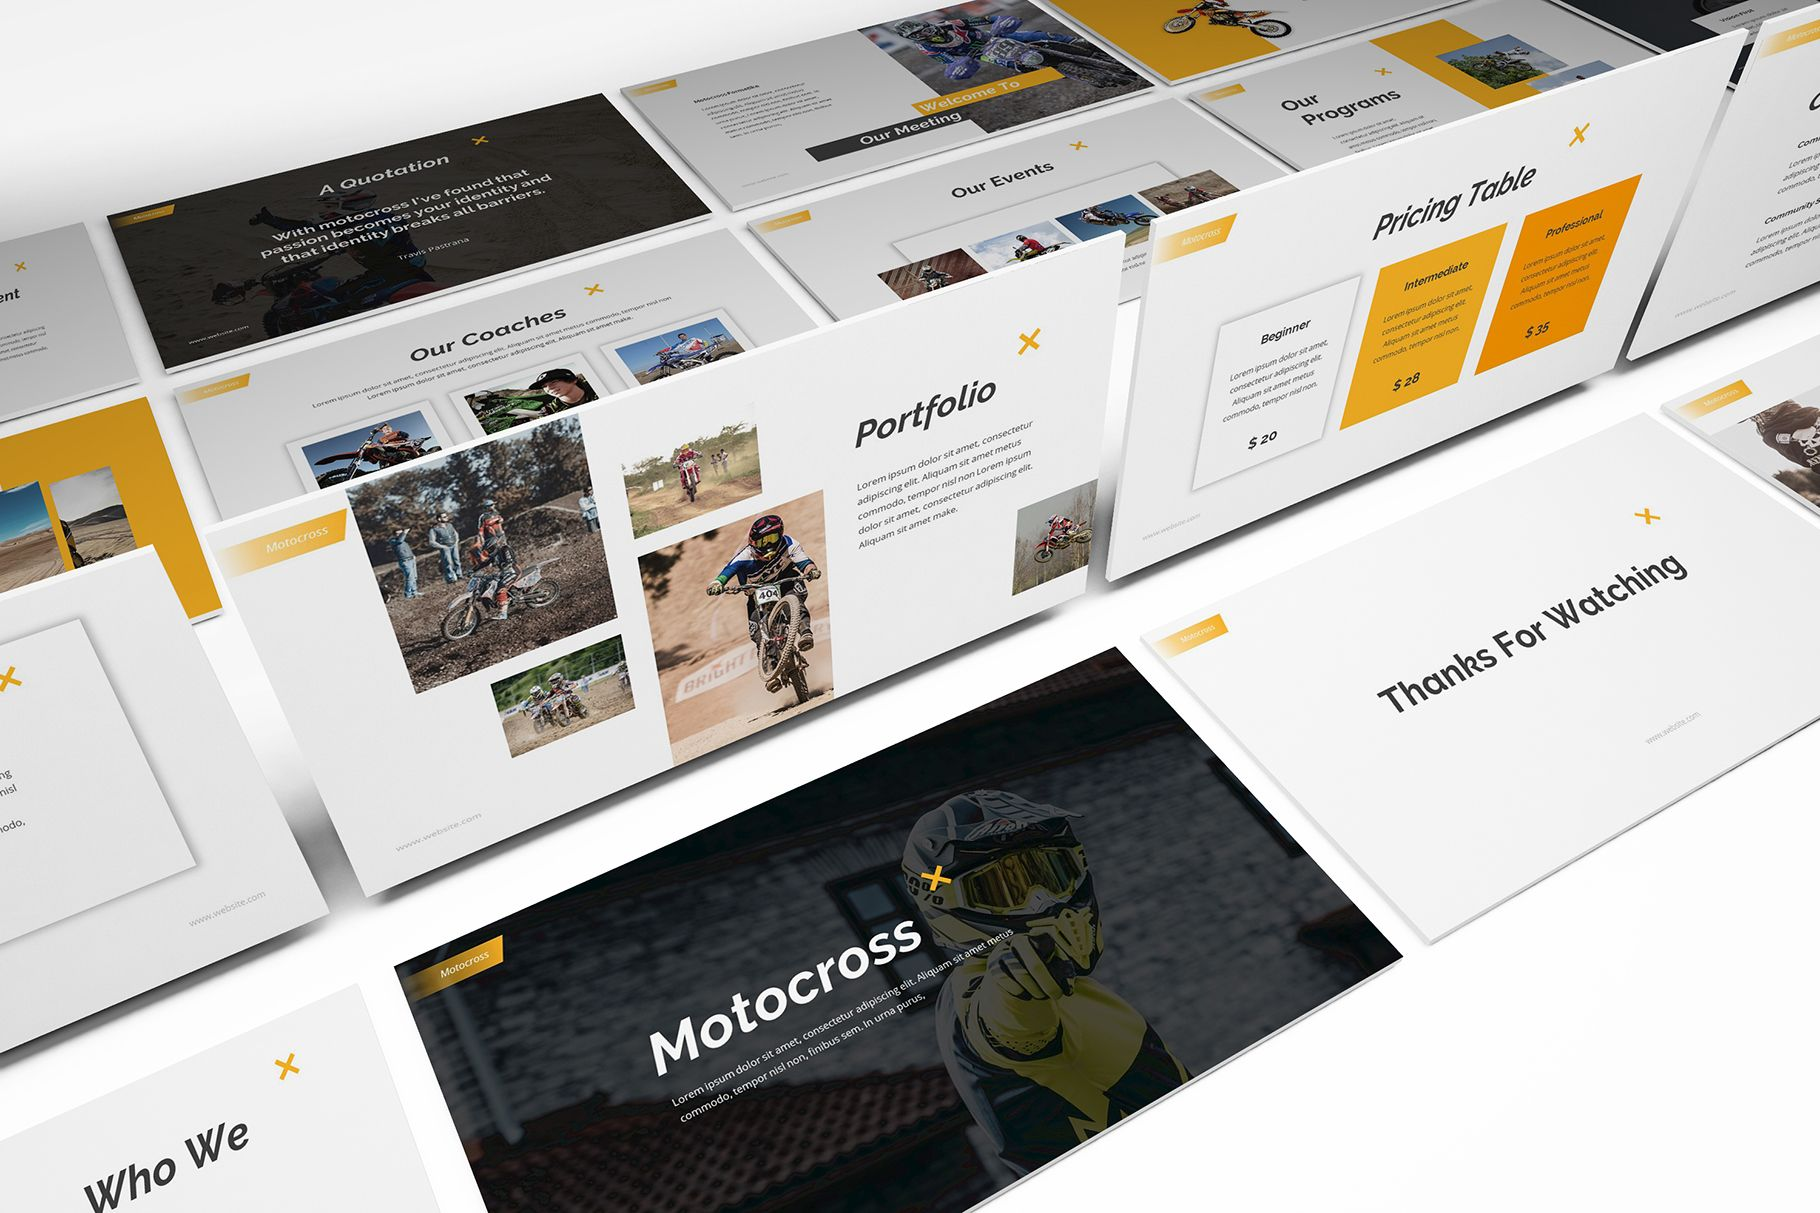 Motocross Powerpoint Template 474723 Presentation Templates Design Bundles Powerpoint Templates Presentation Templates Google Slides Template